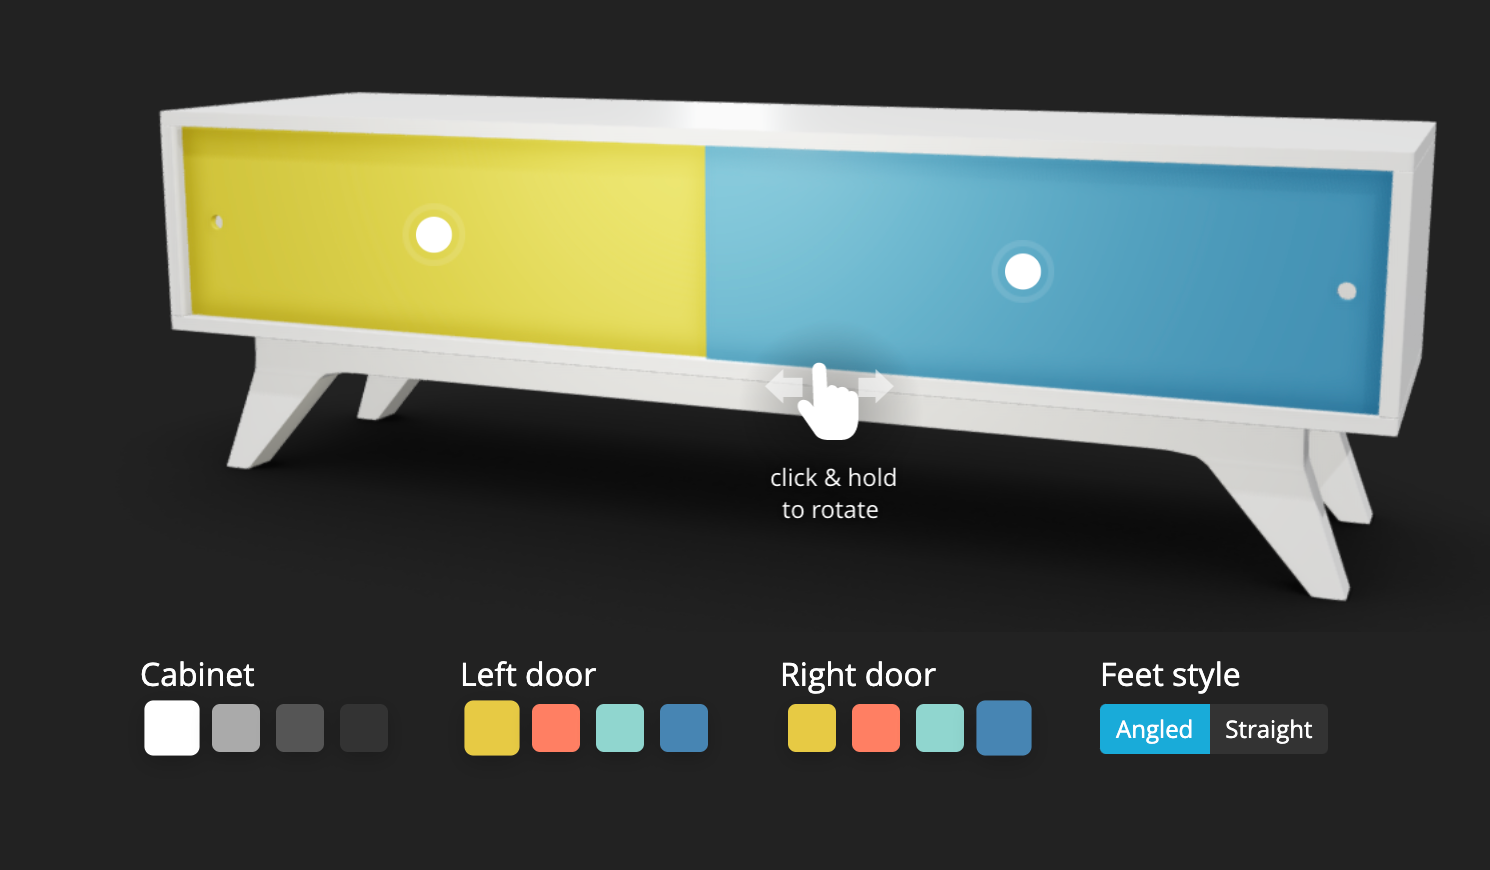 Sketchfab Software - Sketchfab 3D furniture configurator